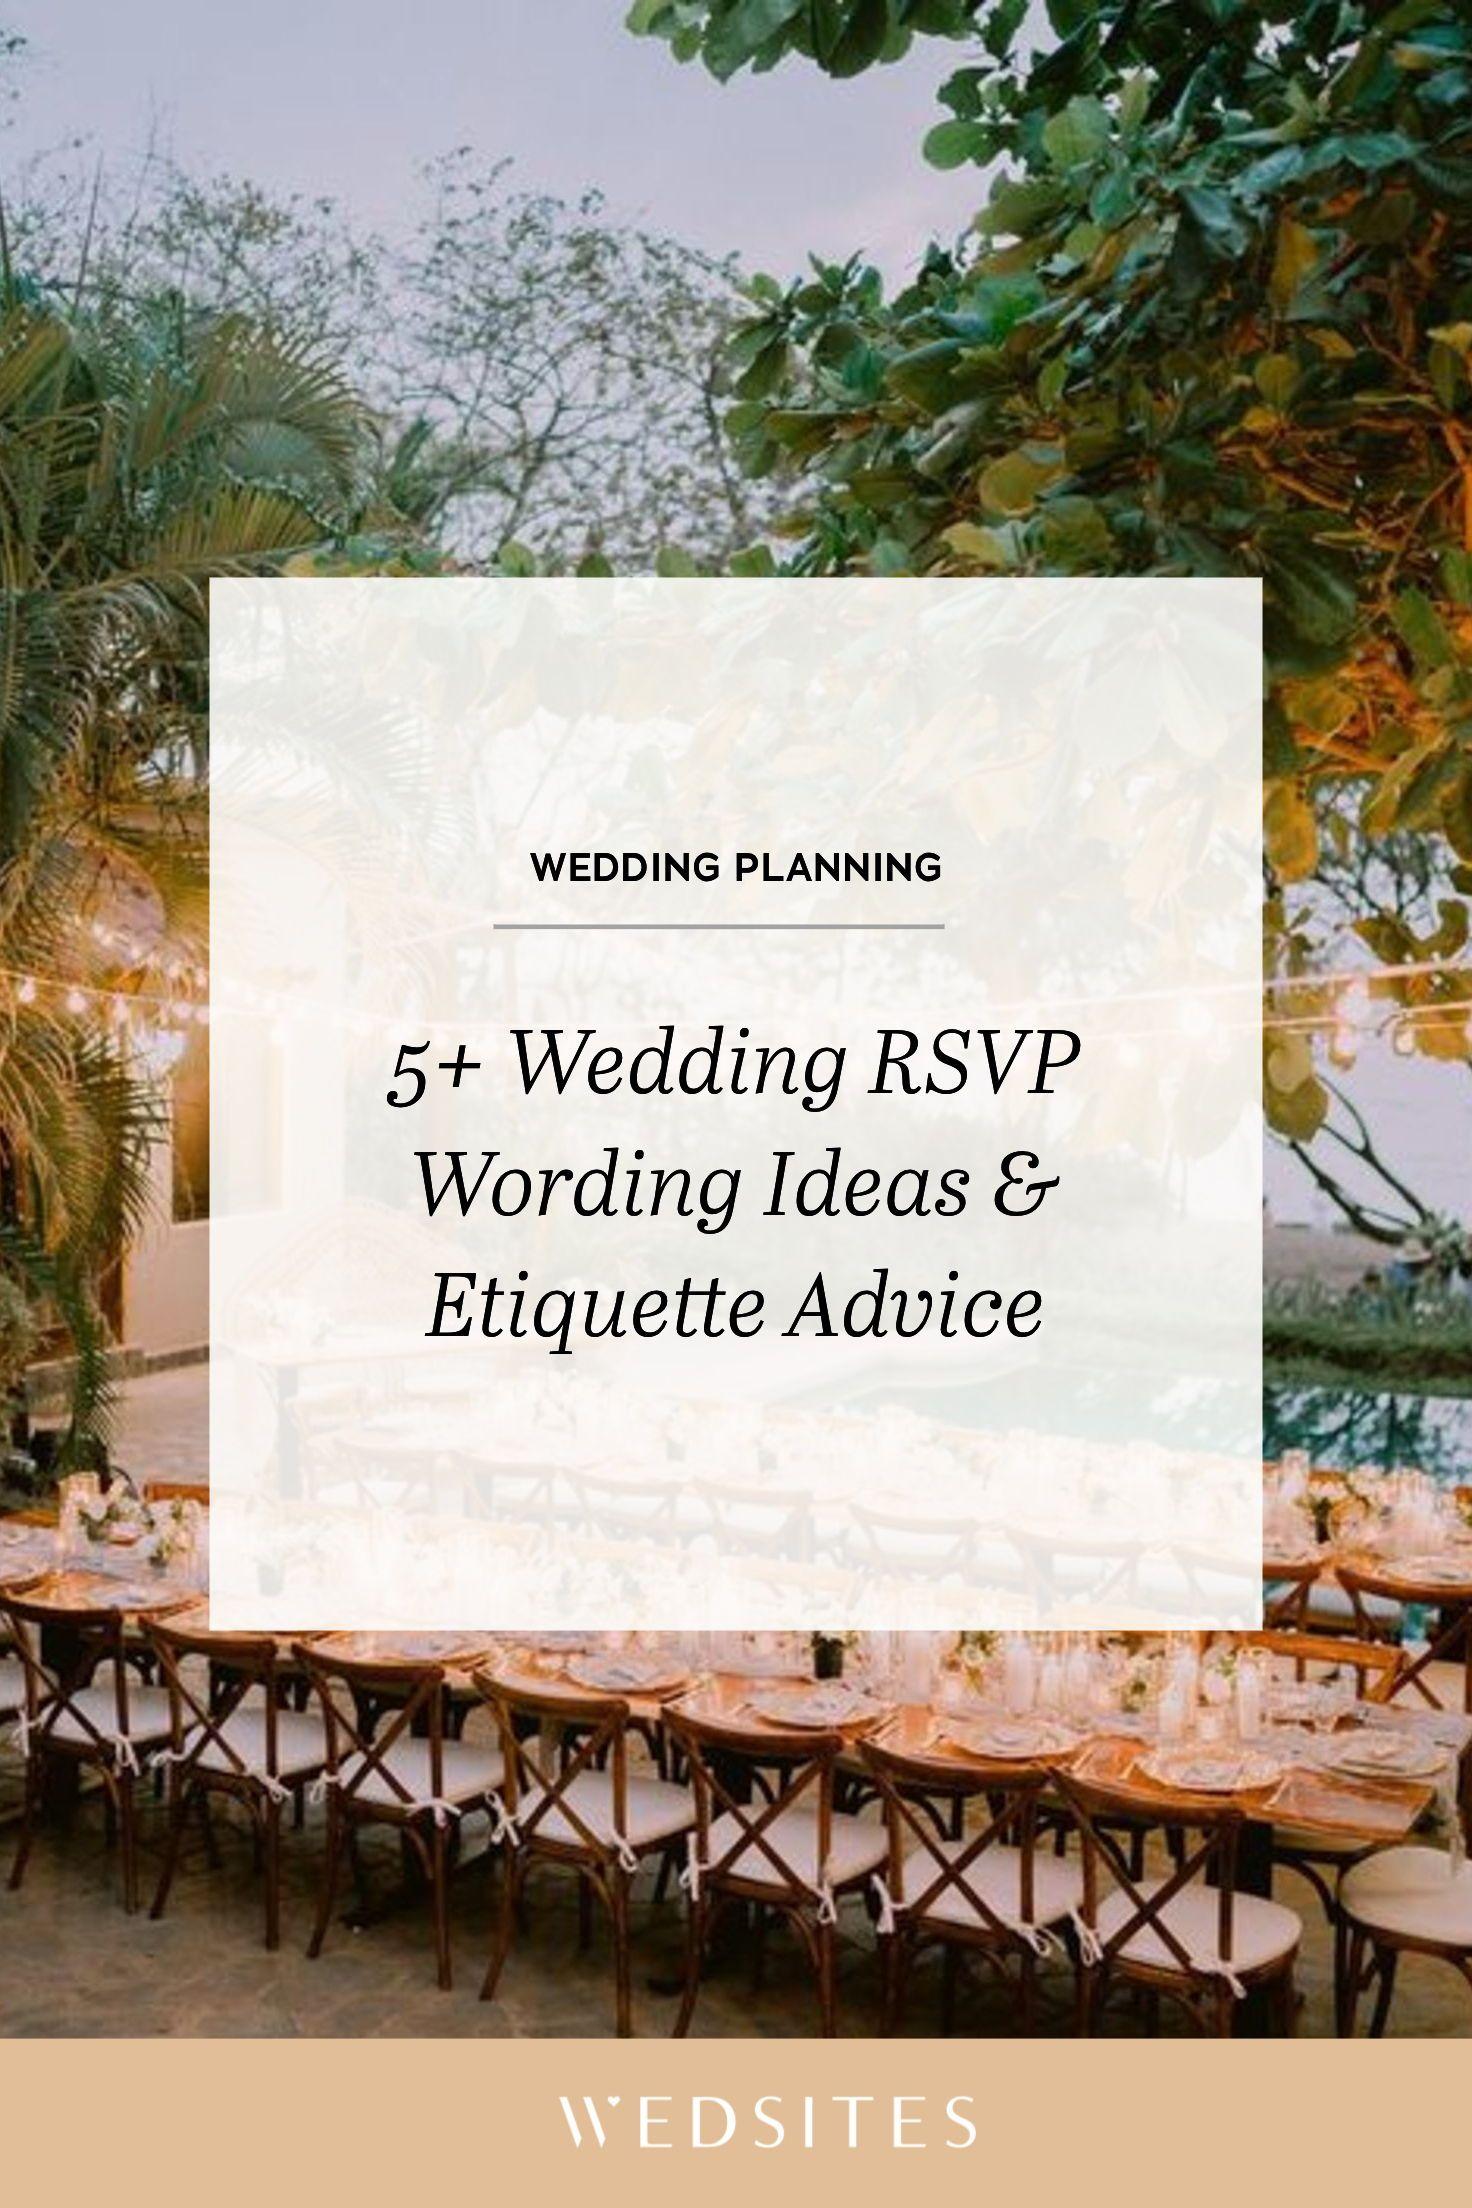 5+ Wedding RSVP Wording Ideas & Timeline Etiquette